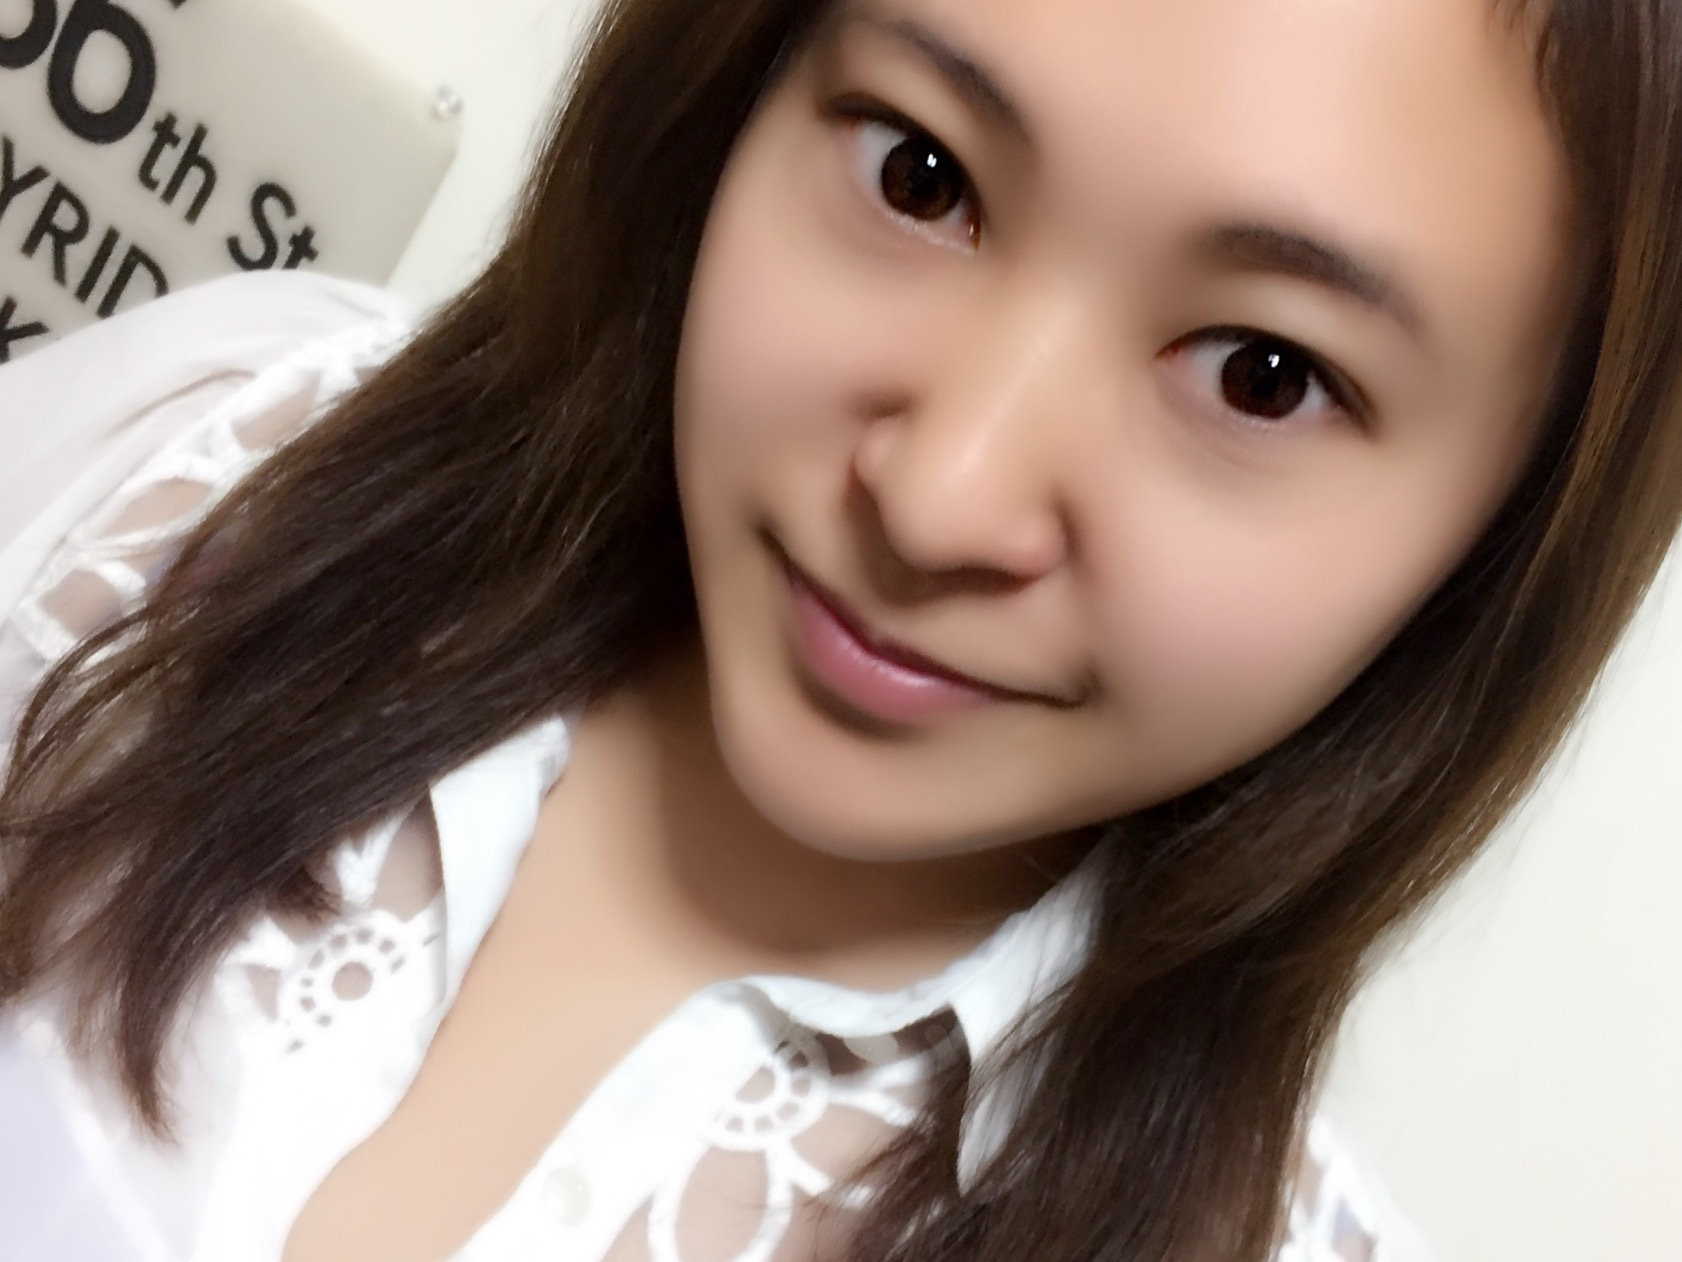 TOMOssc - Japanese webcam girl